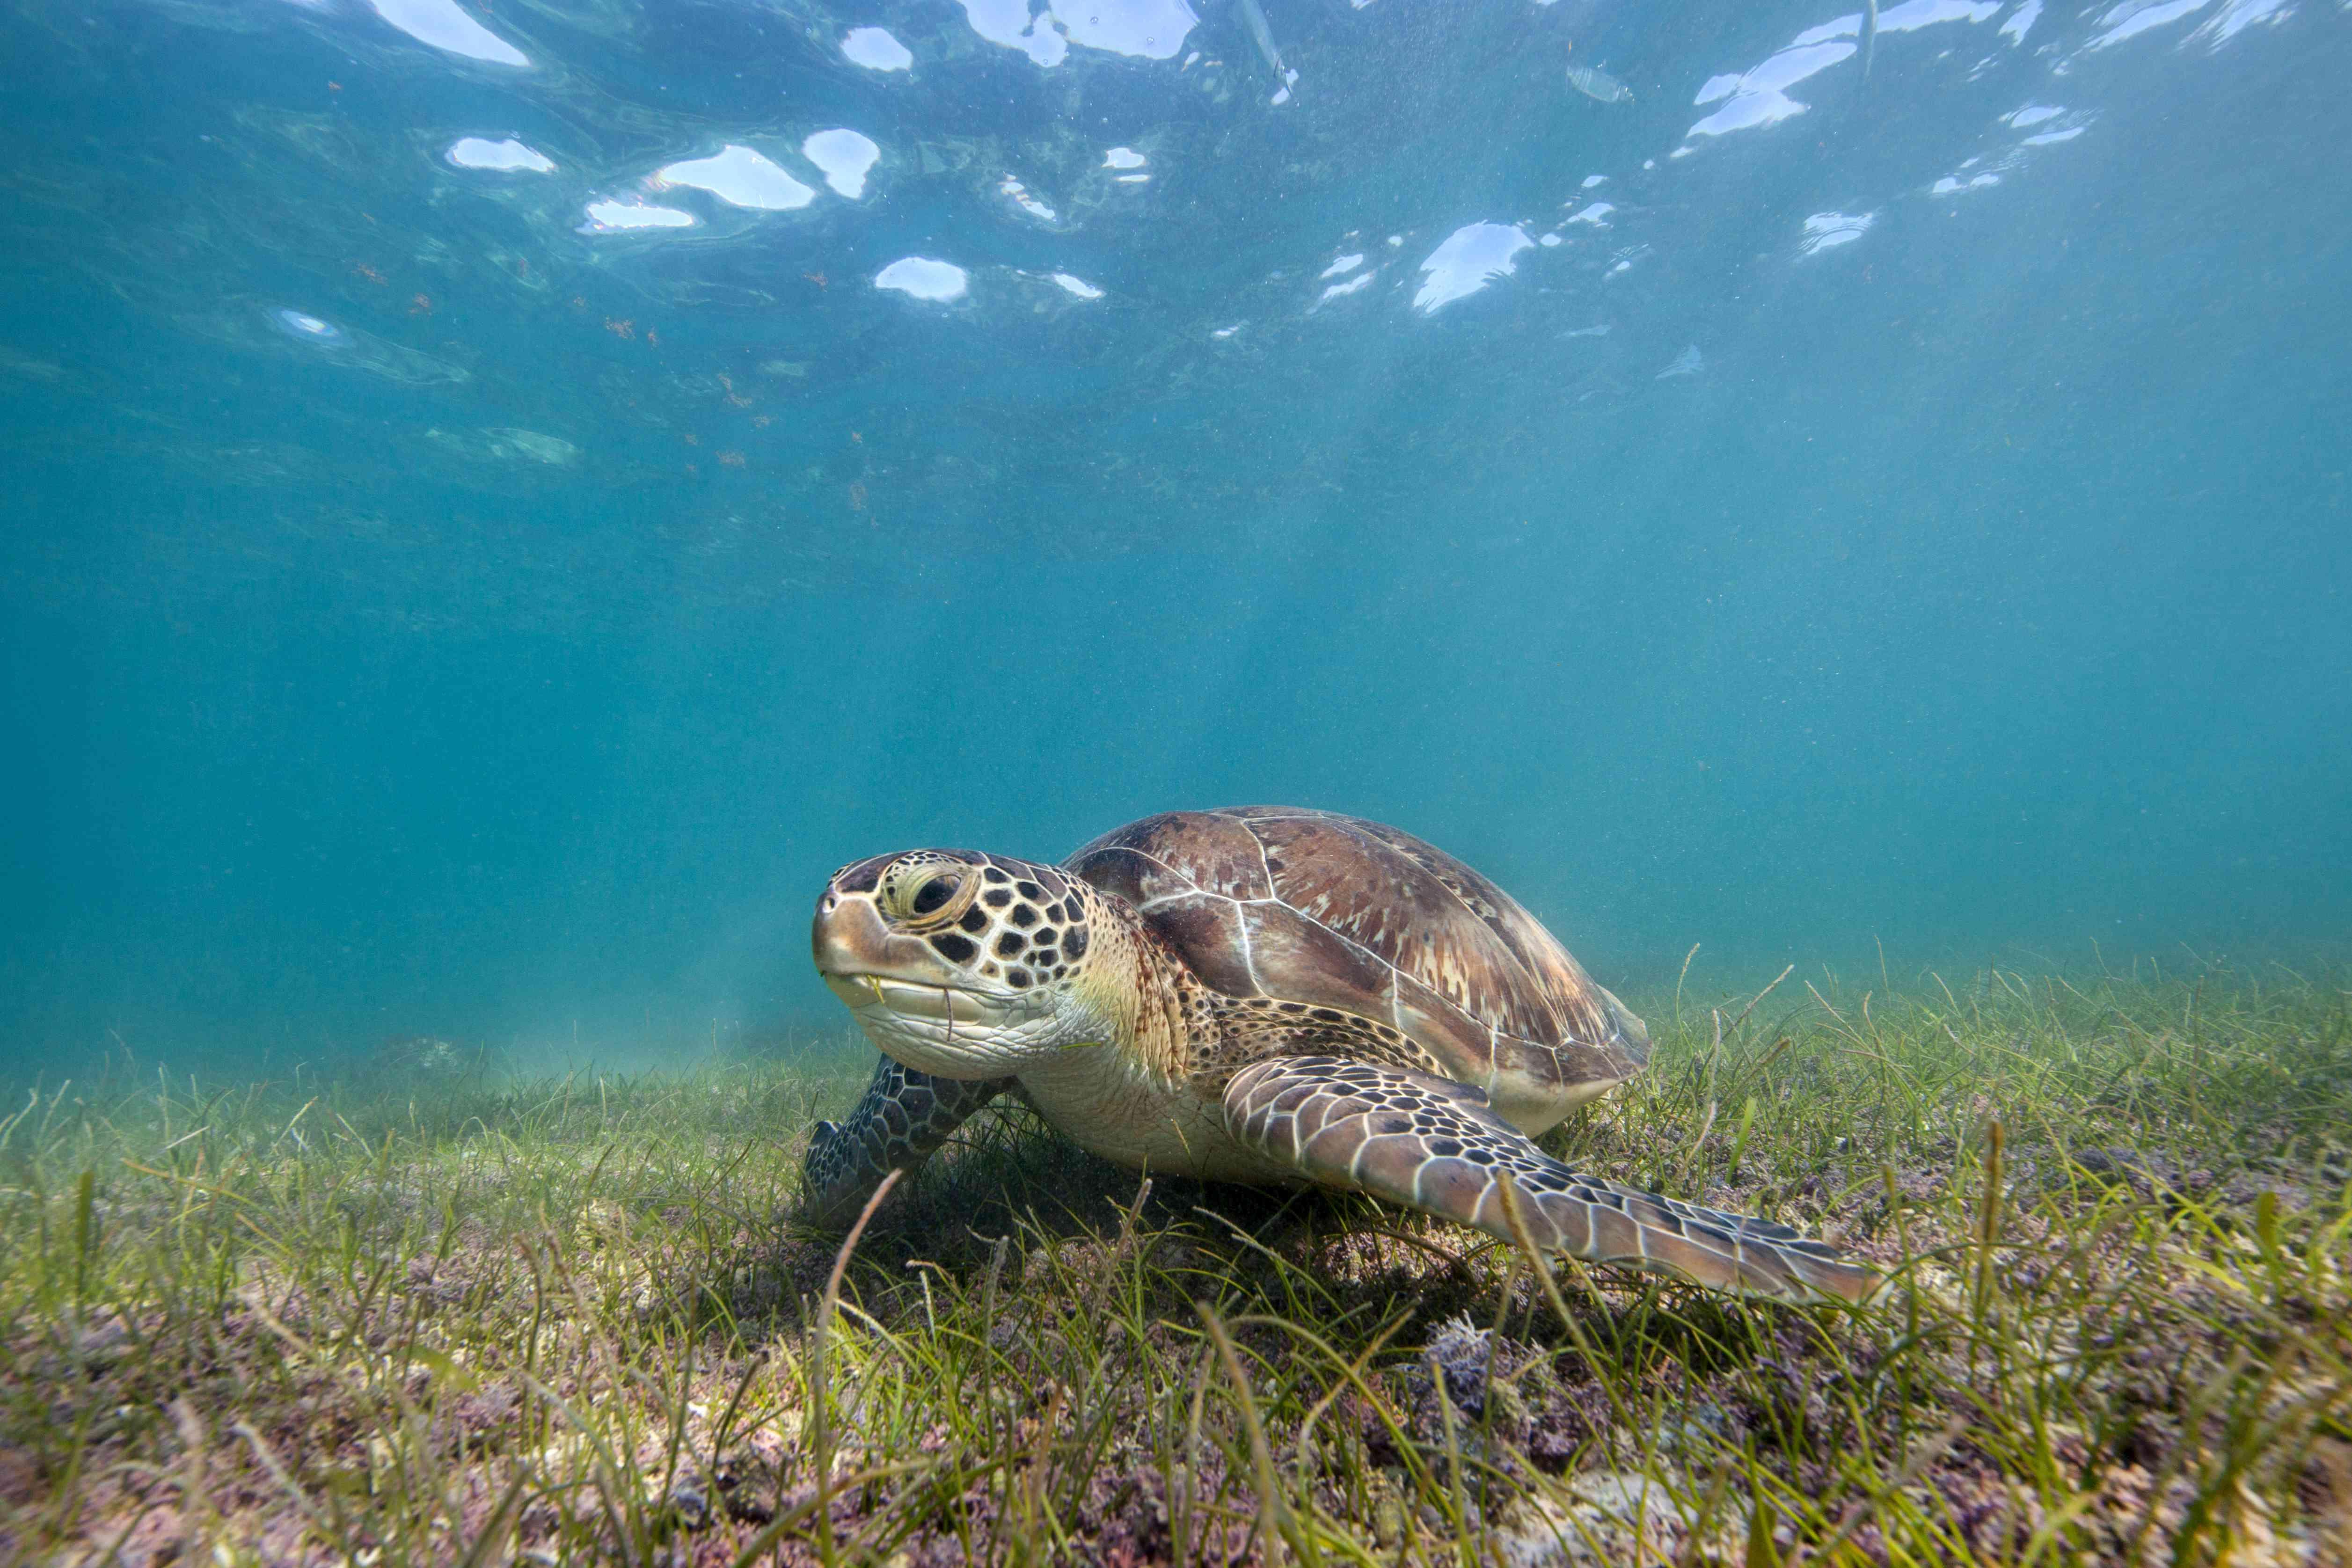 Green Sea Turtle feeding on sea grass